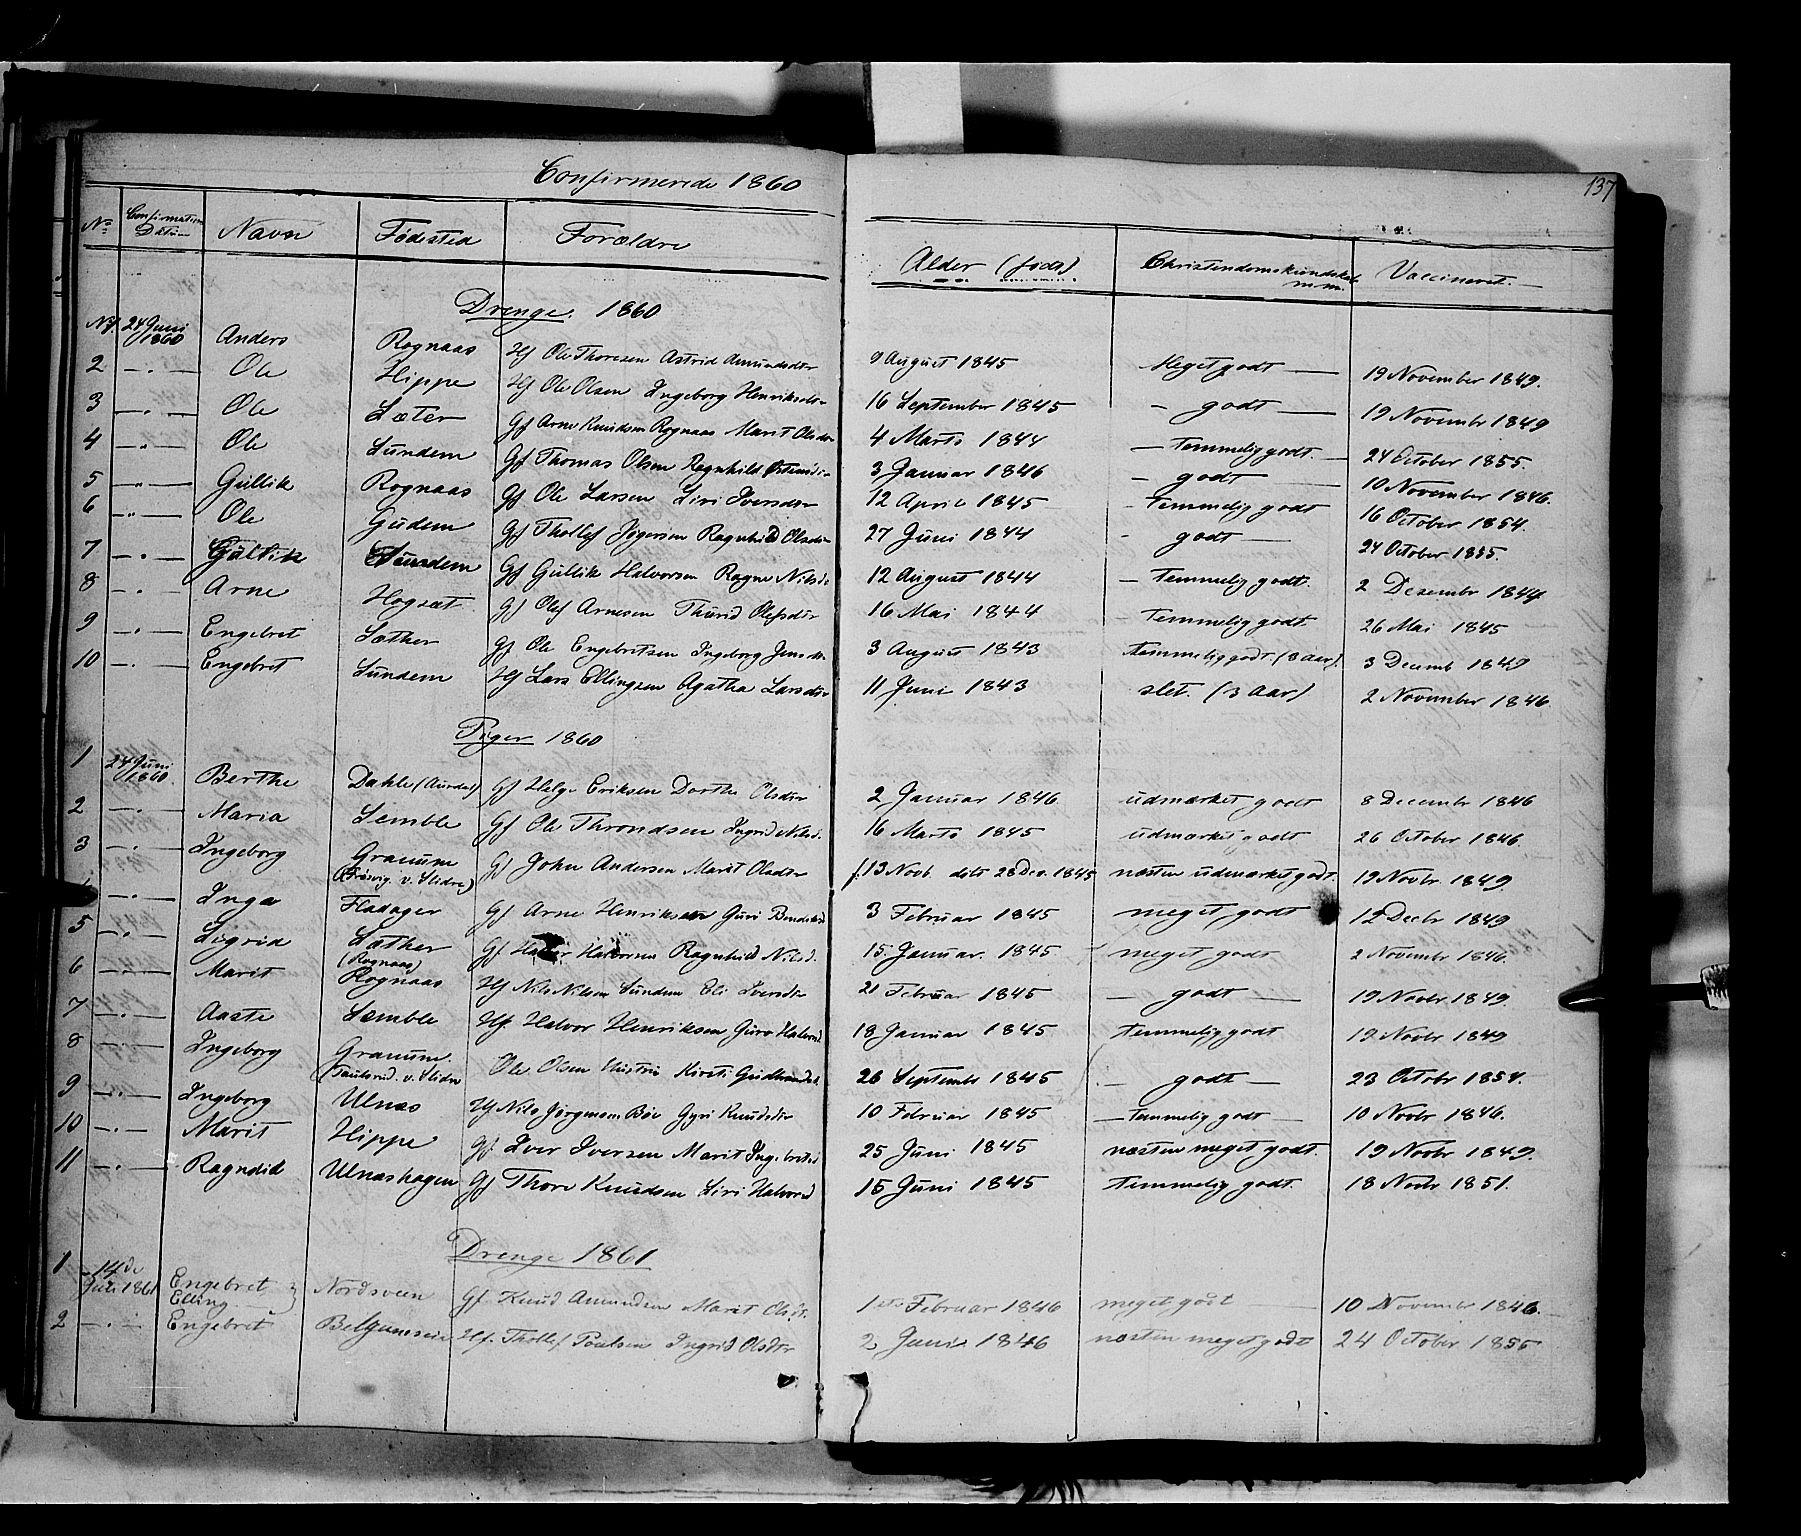 SAH, Nord-Aurdal prestekontor, Ministerialbok nr. 6, 1842-1863, s. 137